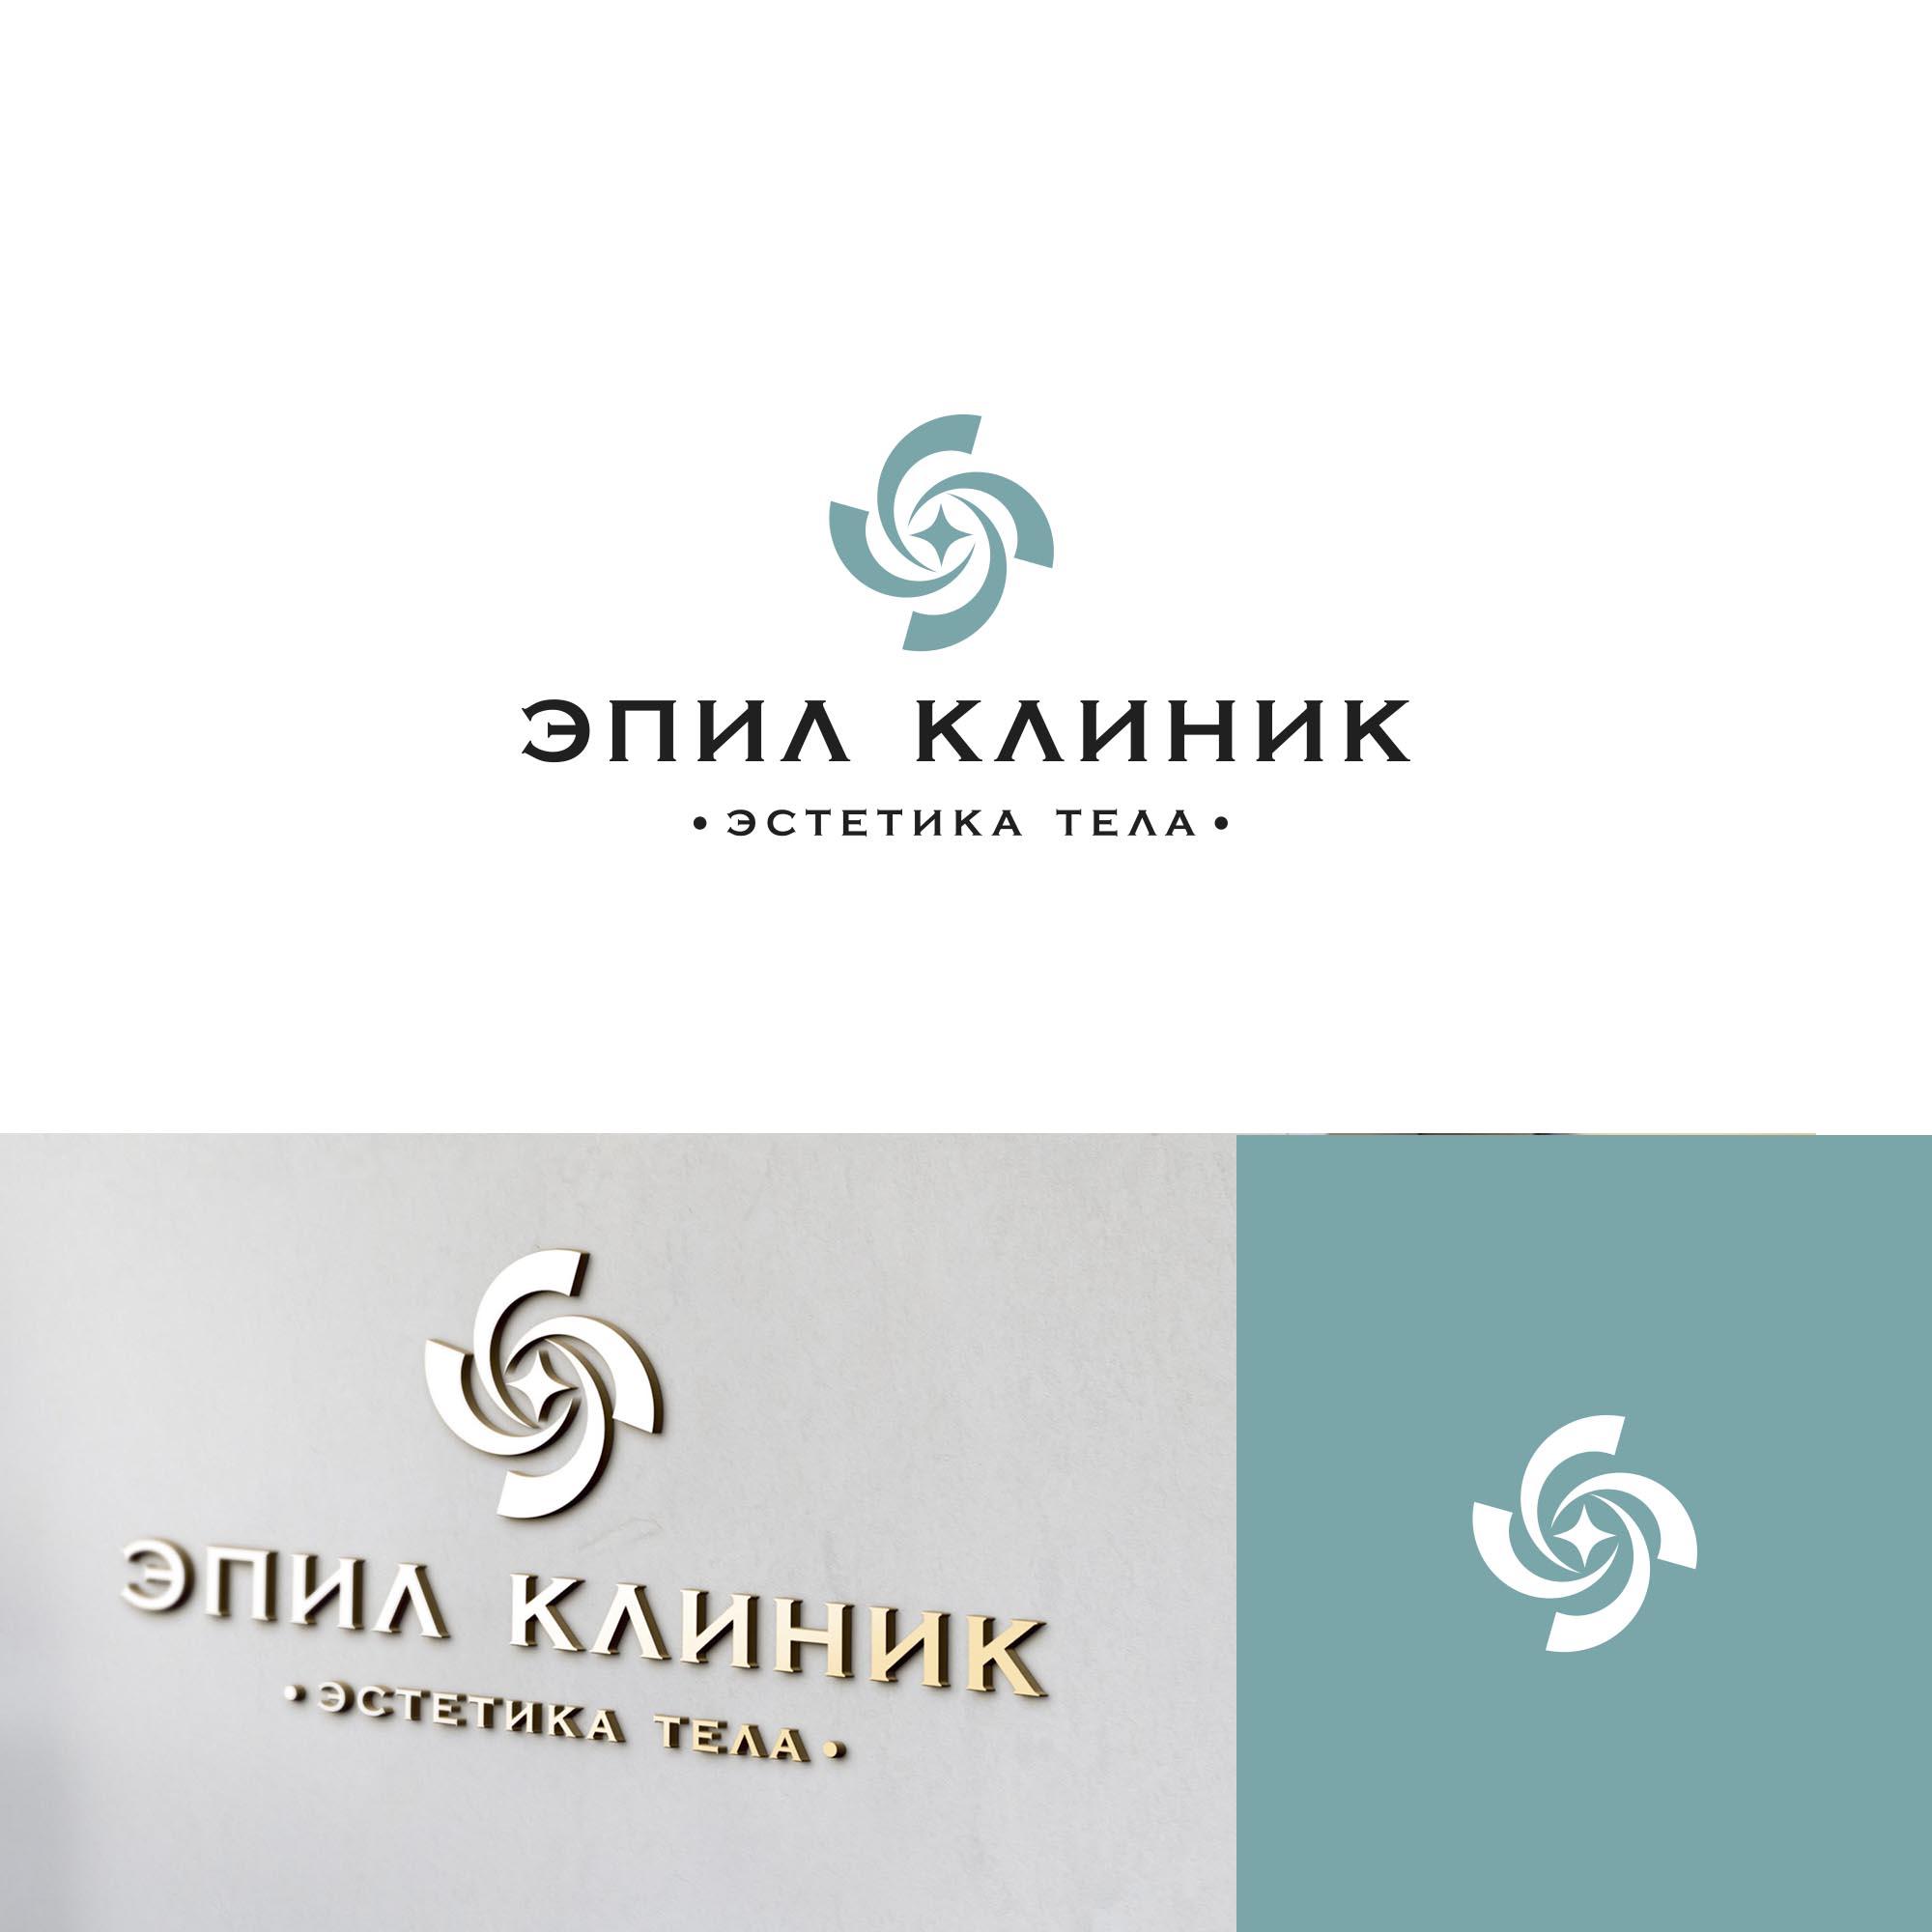 Логотип , фирменный стиль  фото f_3475e1806f1881ca.jpg